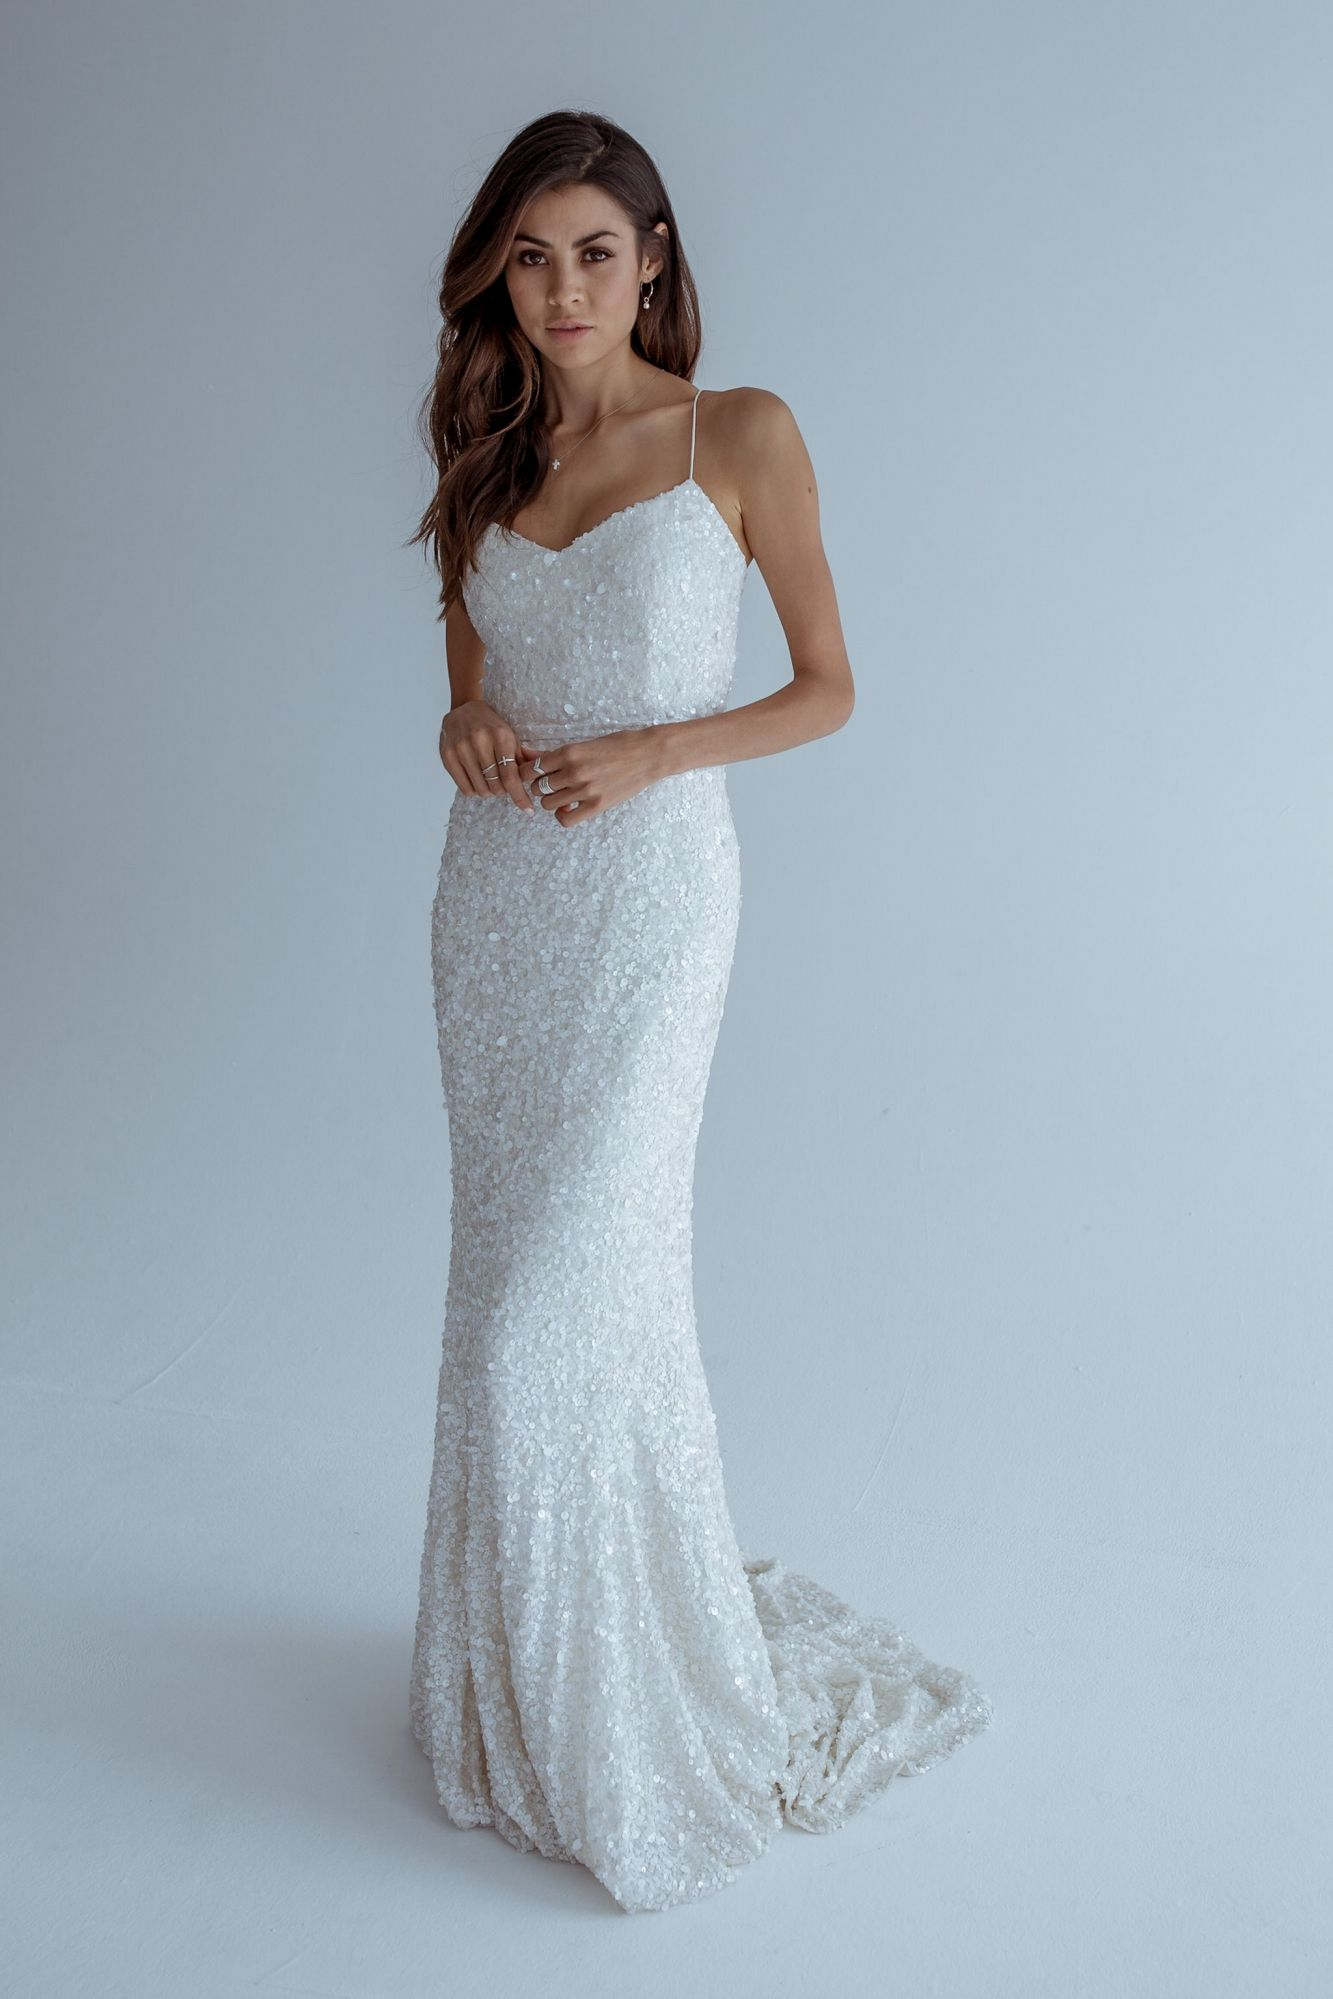 Anya KWH by Karen Willis Holmes Wedding dress sequin